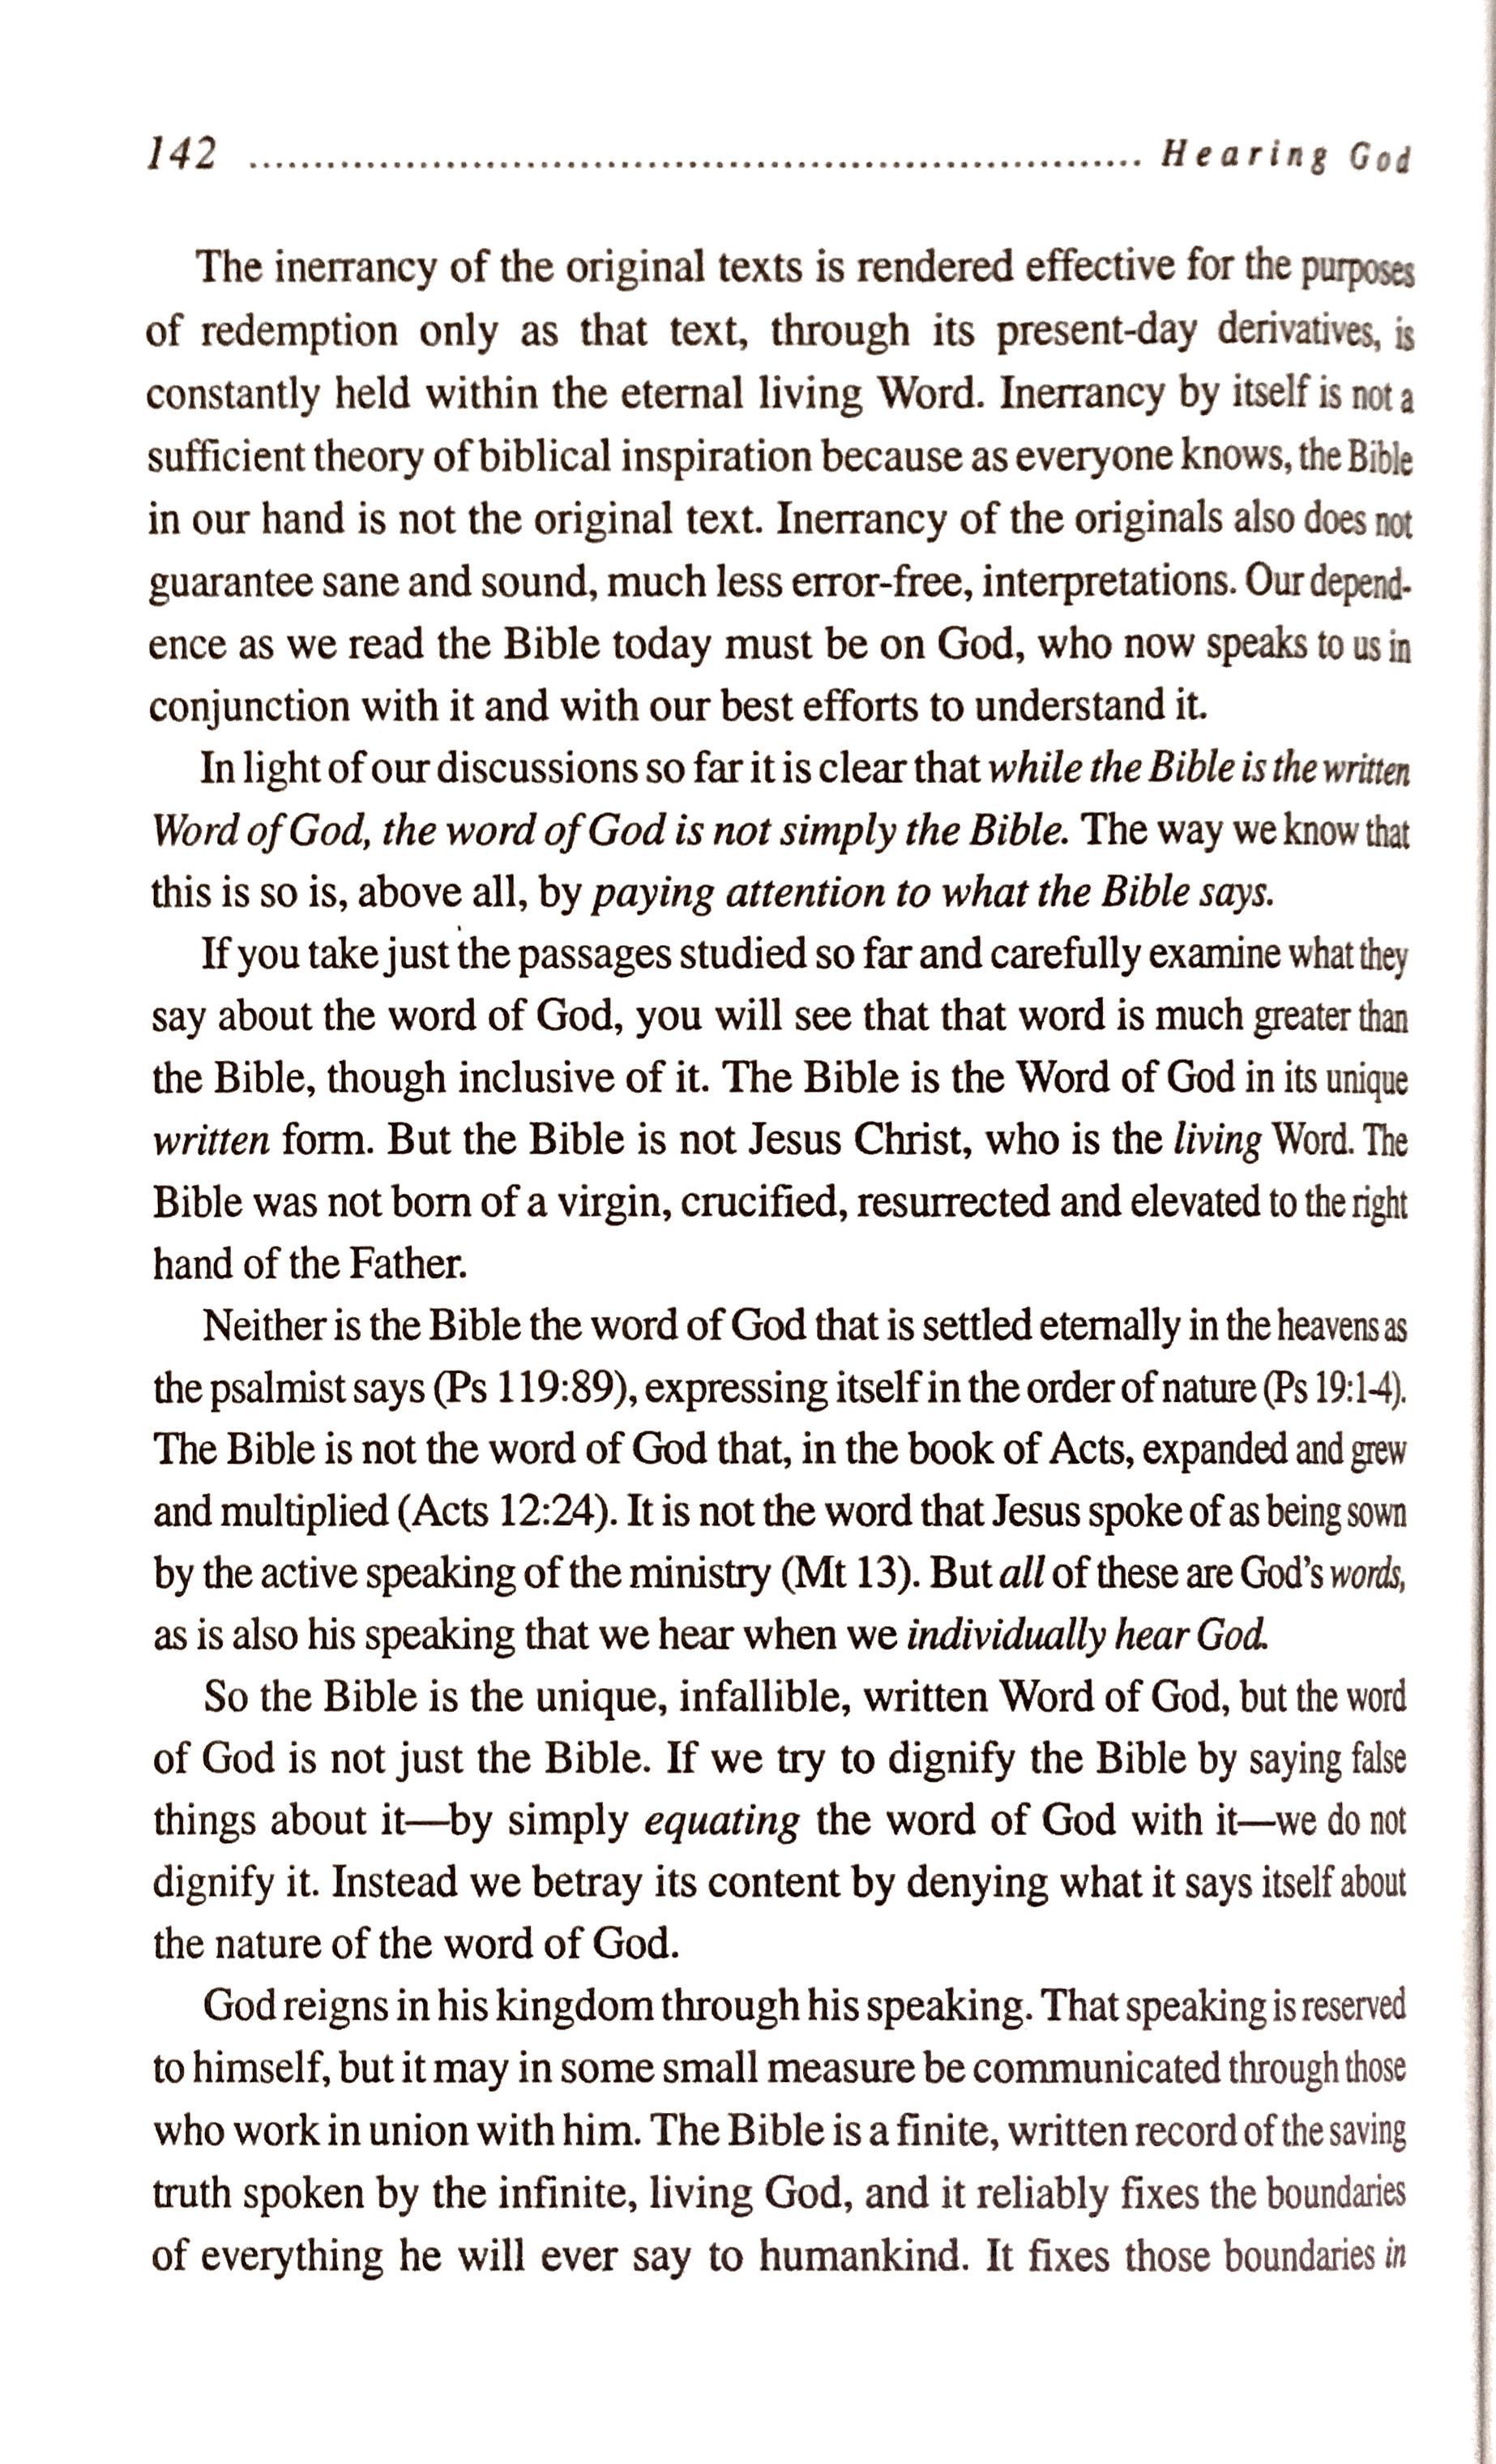 Willard on the word of God 2